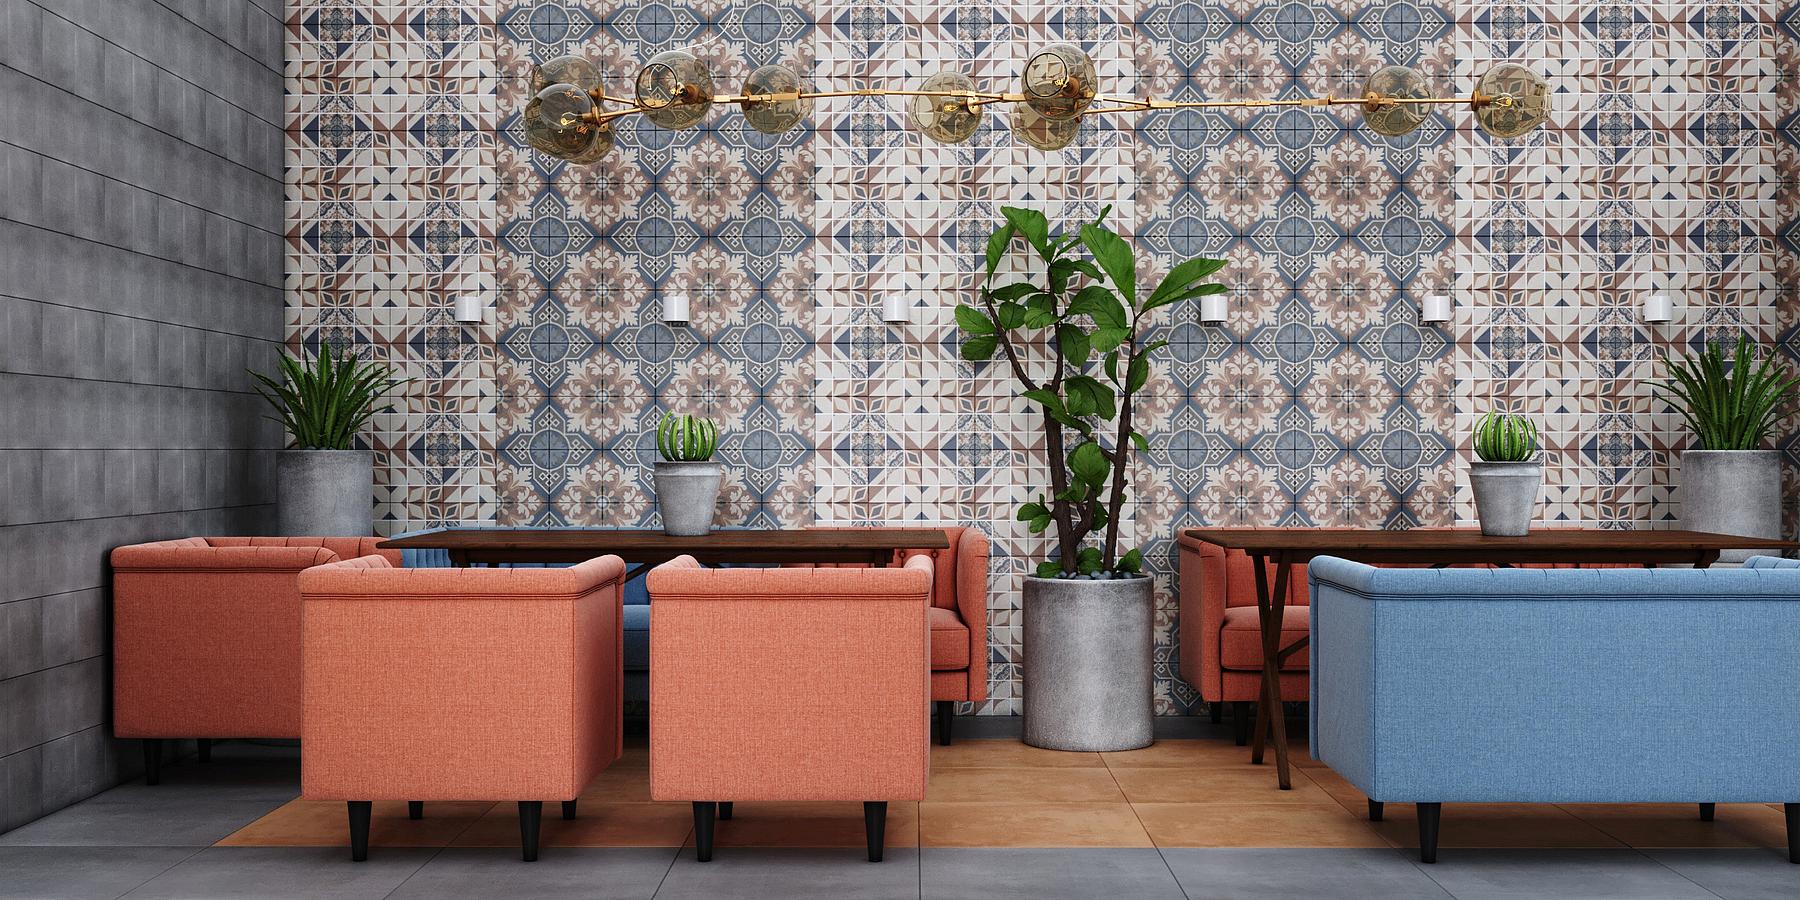 Century Unlimited Ceramic And Porcelain Tiles By Villeroy Boch - Preisliste villeroy und boch